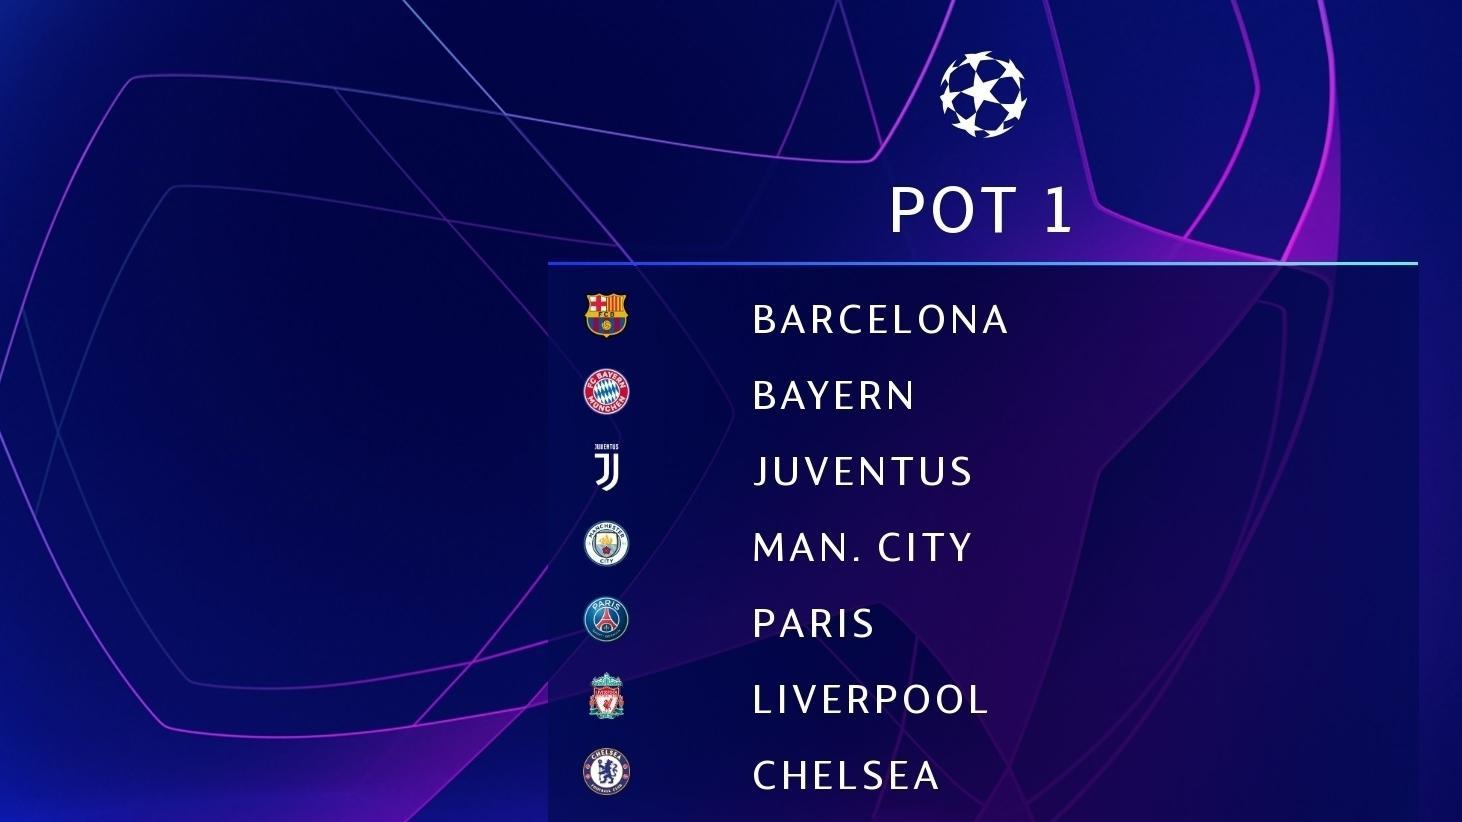 Champions League Group Stage Draw Pot 1 Uefa Champions League Uefa Com